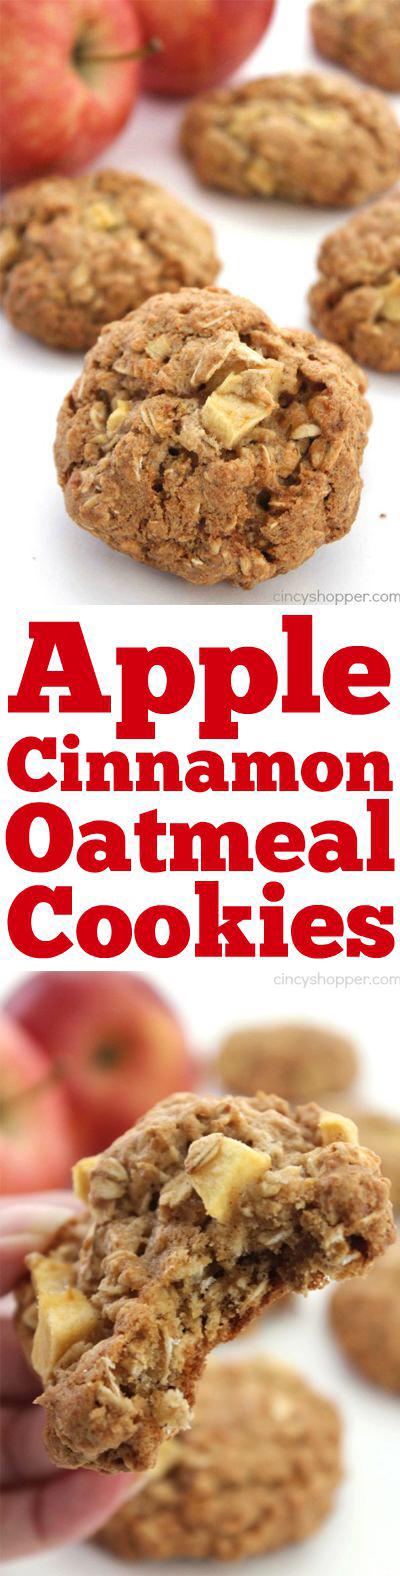 Apple Cinnamon Oatmeal Cookies - CincyShopper